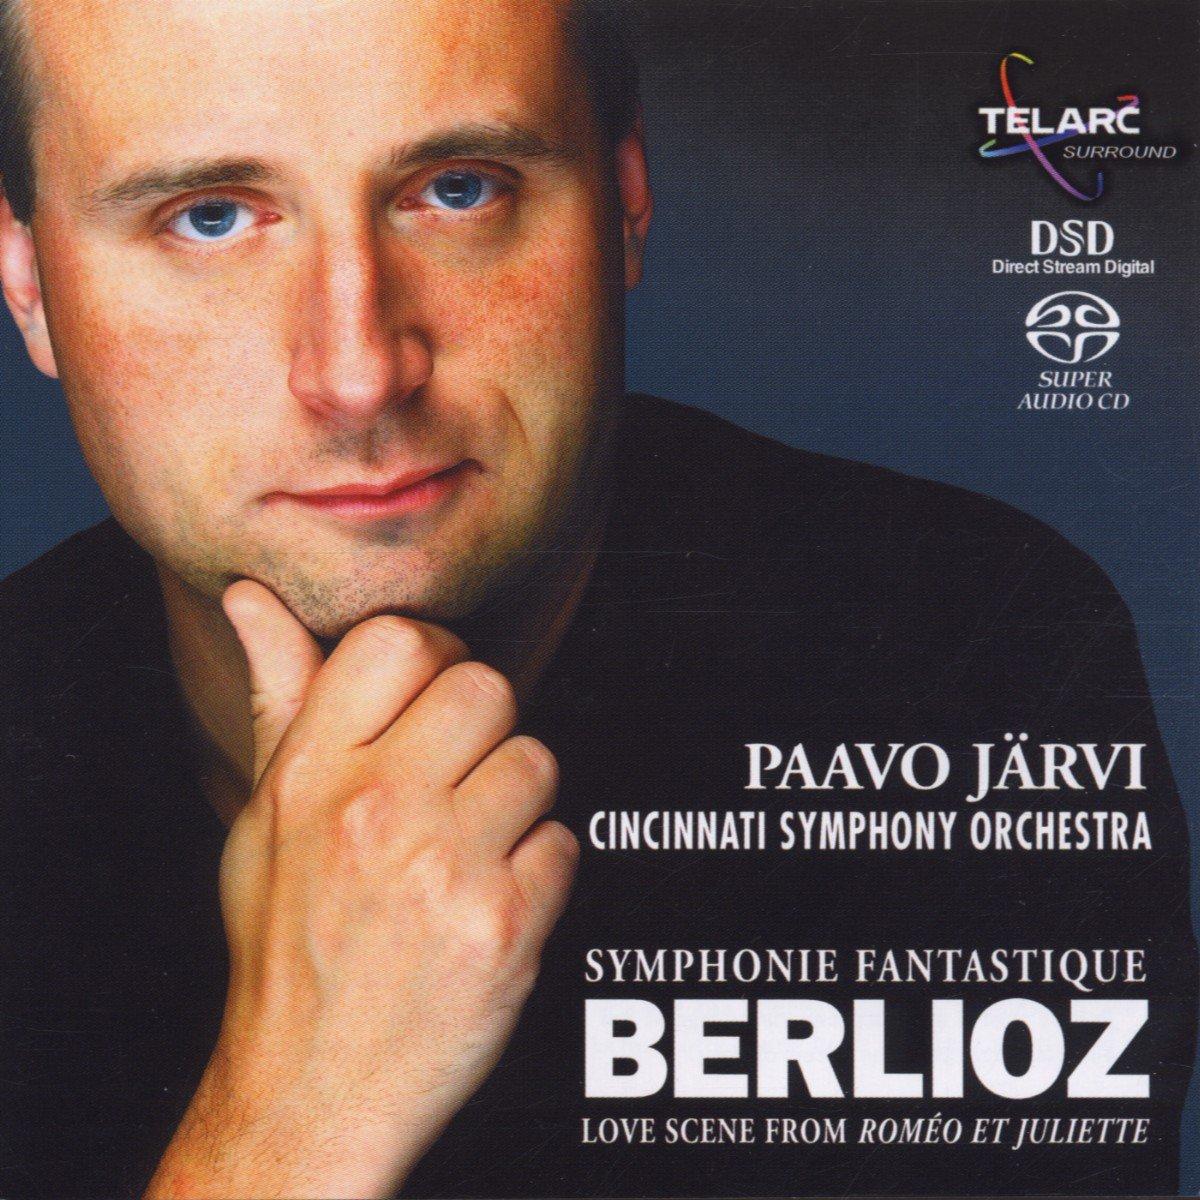 Berlioz: Symphonie Fantastique, Op. 14 / ''Romeo & Juliette'' (Love Scene) by Telarc